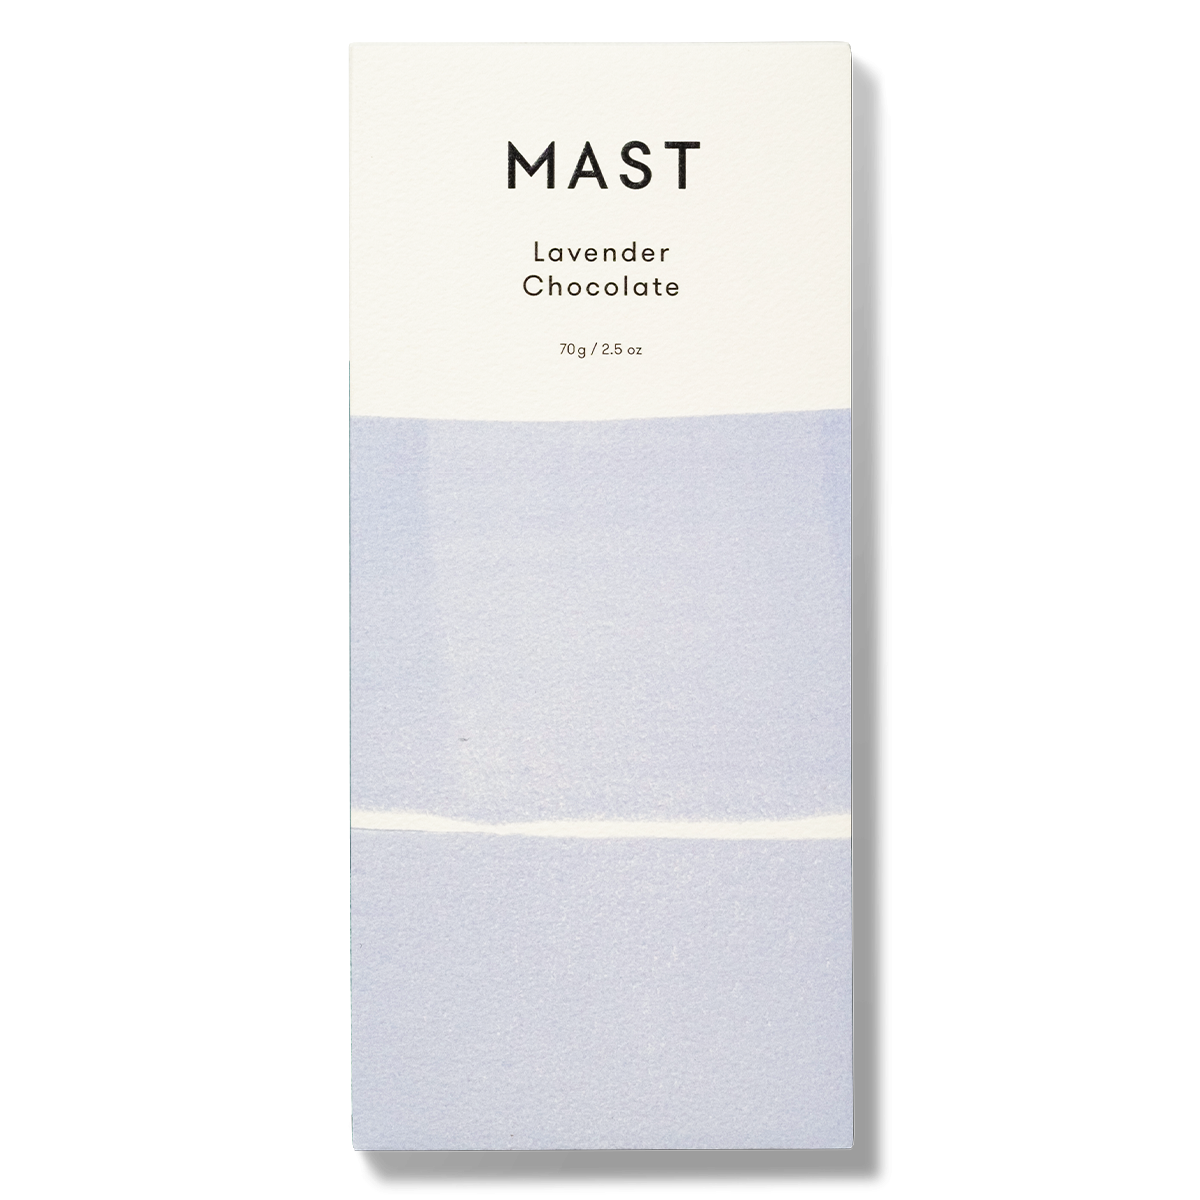 Mast Organic Lavender Chocolate Bar